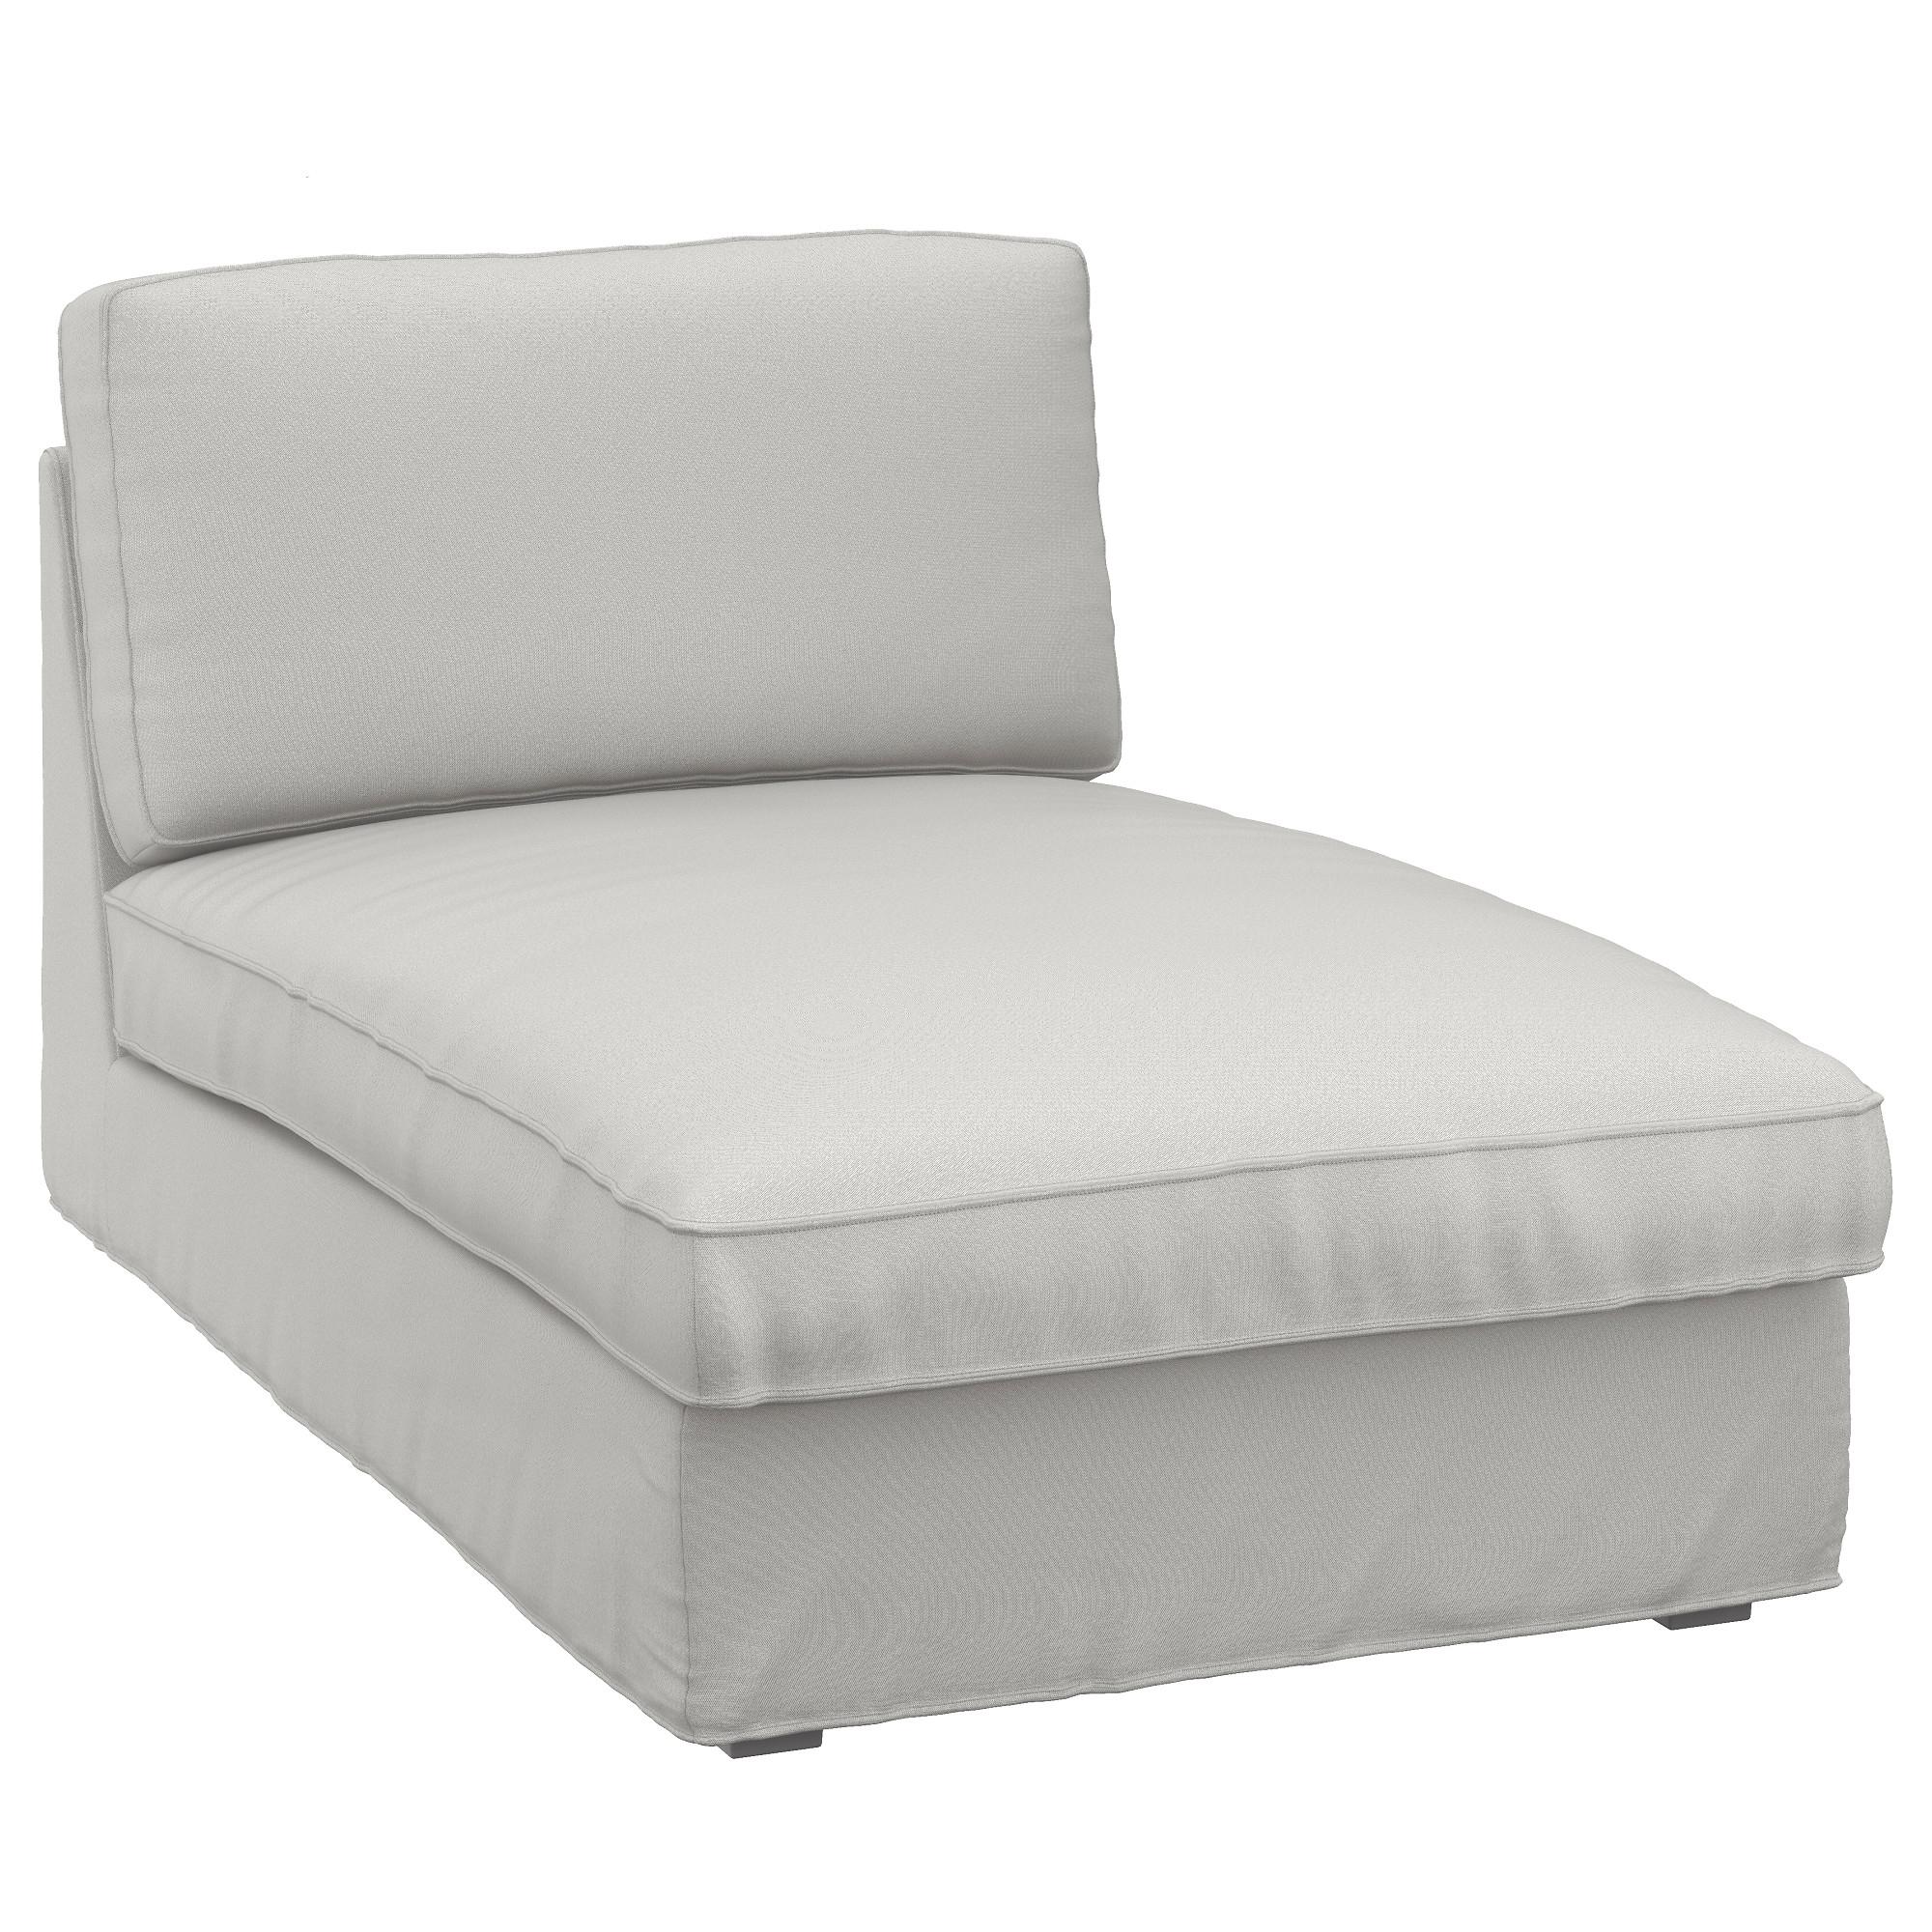 Fashionable Ikea Chaise Longues Inside Kivik Chaise Longue Ramna Light Grey – Ikea (View 7 of 15)